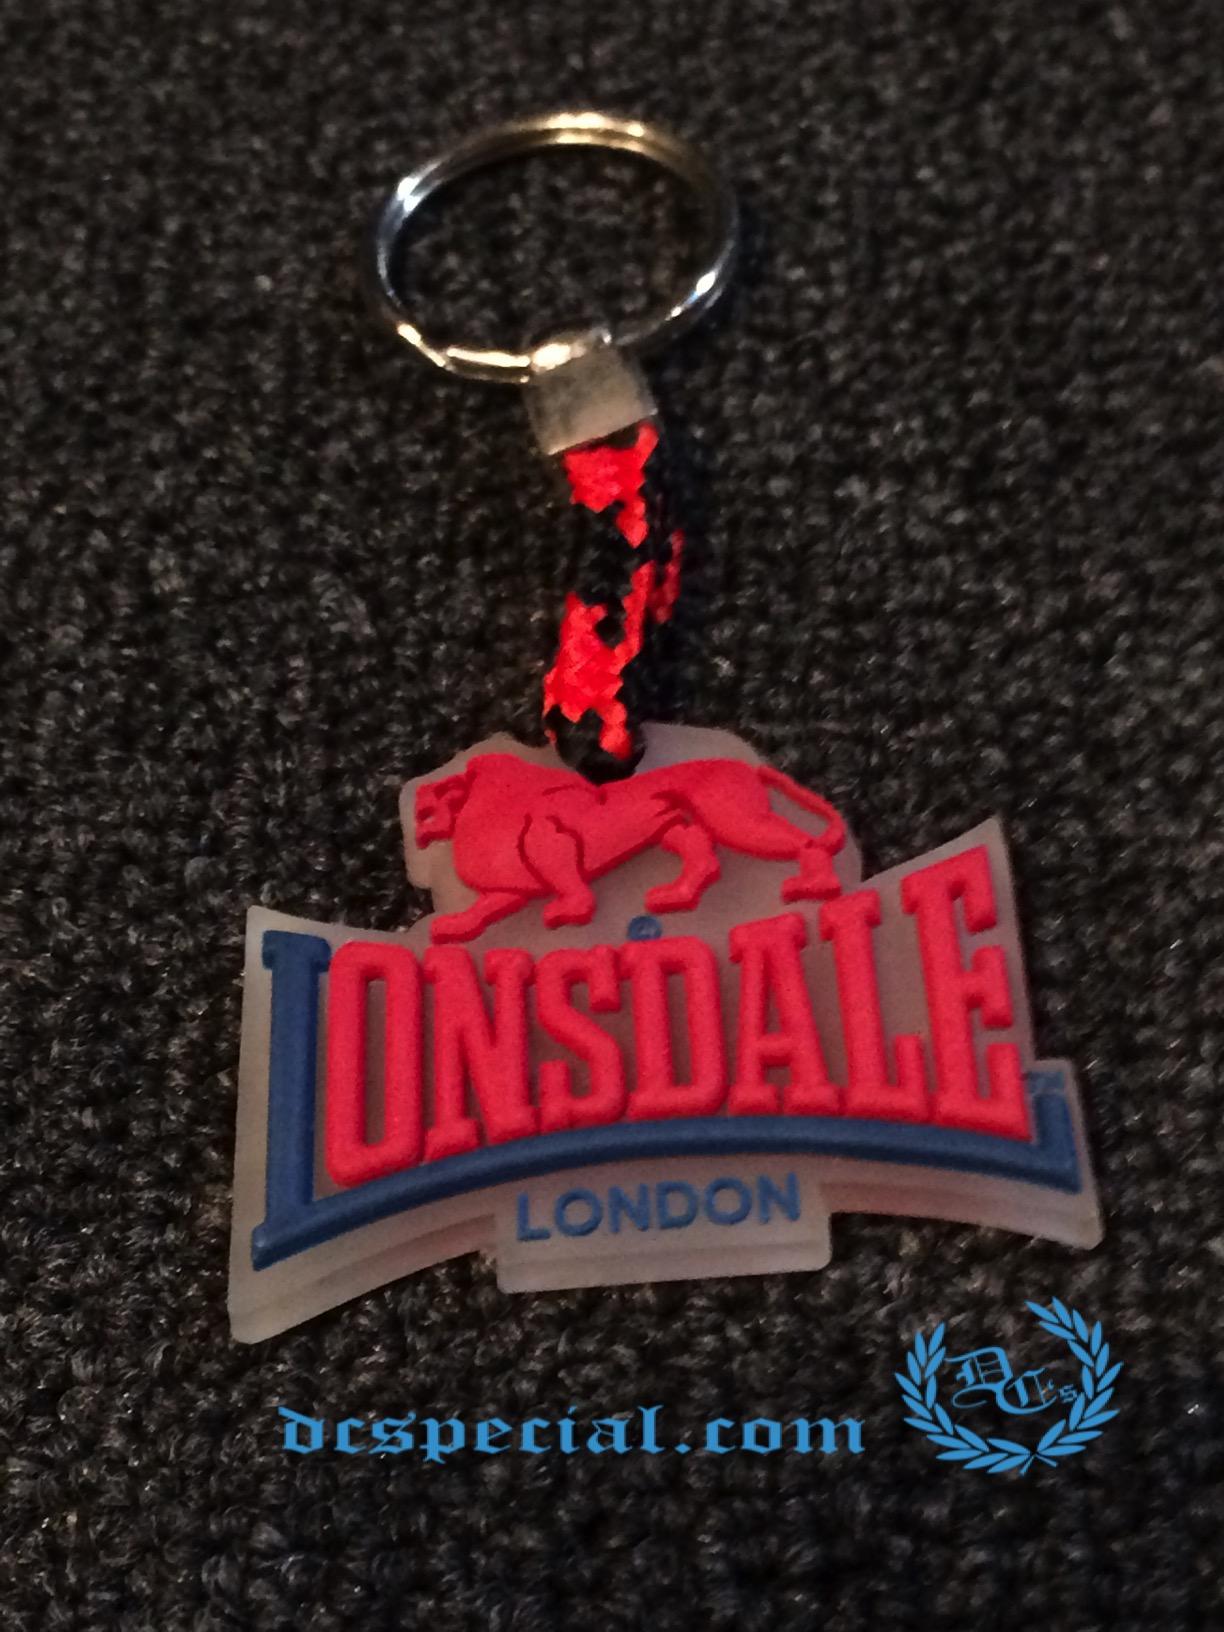 Lonsdale Sleutelhanger 'Lonsdale London'